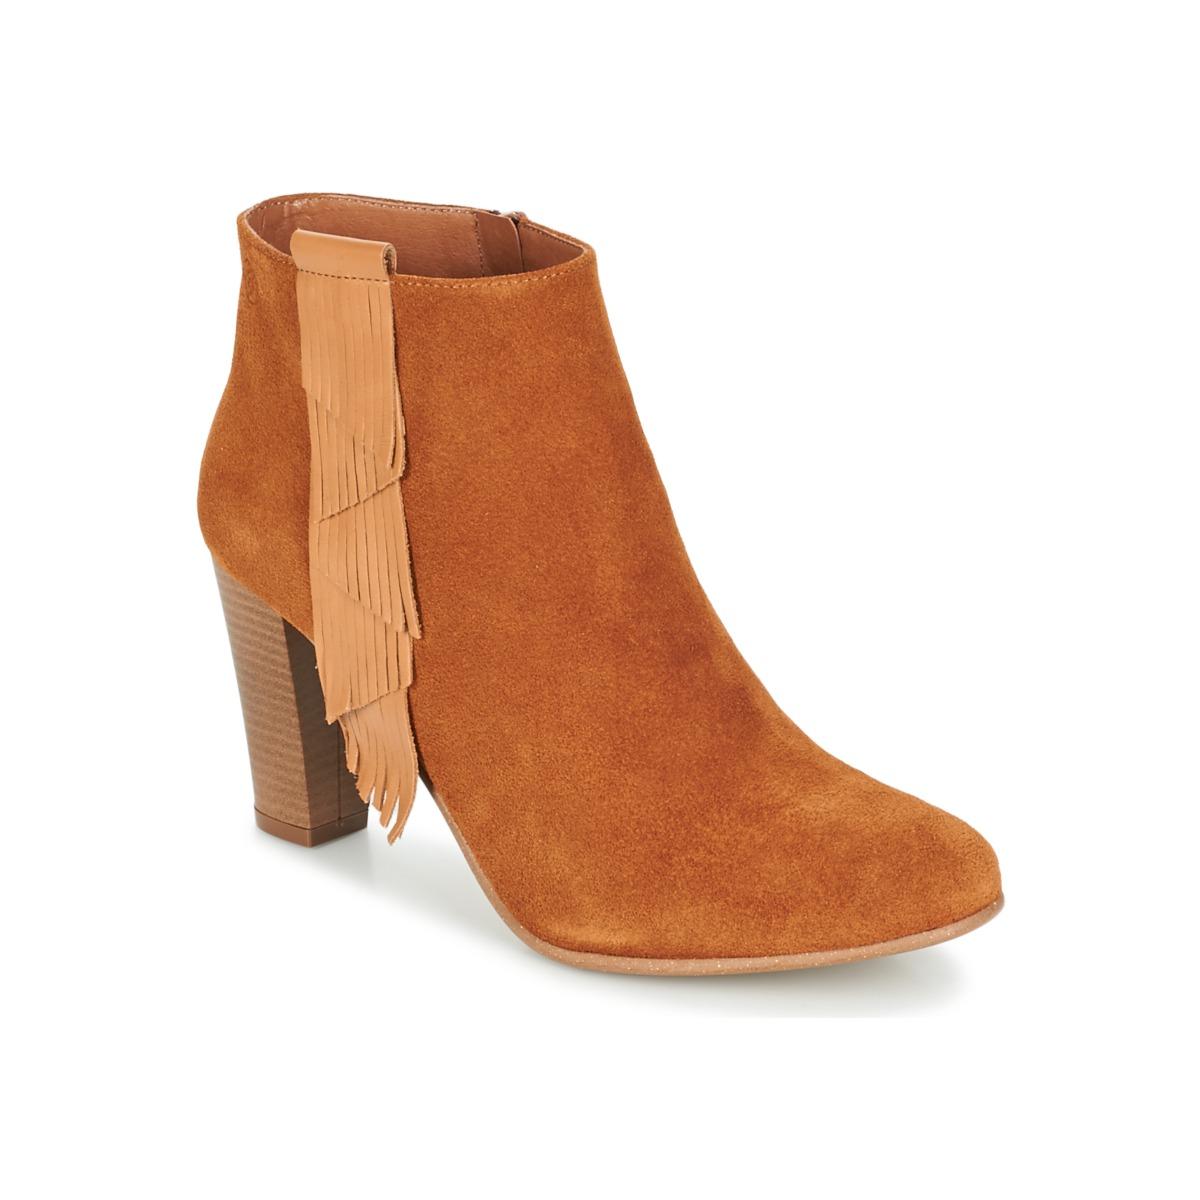 Betty London GAMI Camel - Kostenloser Versand bei Spartoode ! - Schuhe Low Boots Damen 47,50 €